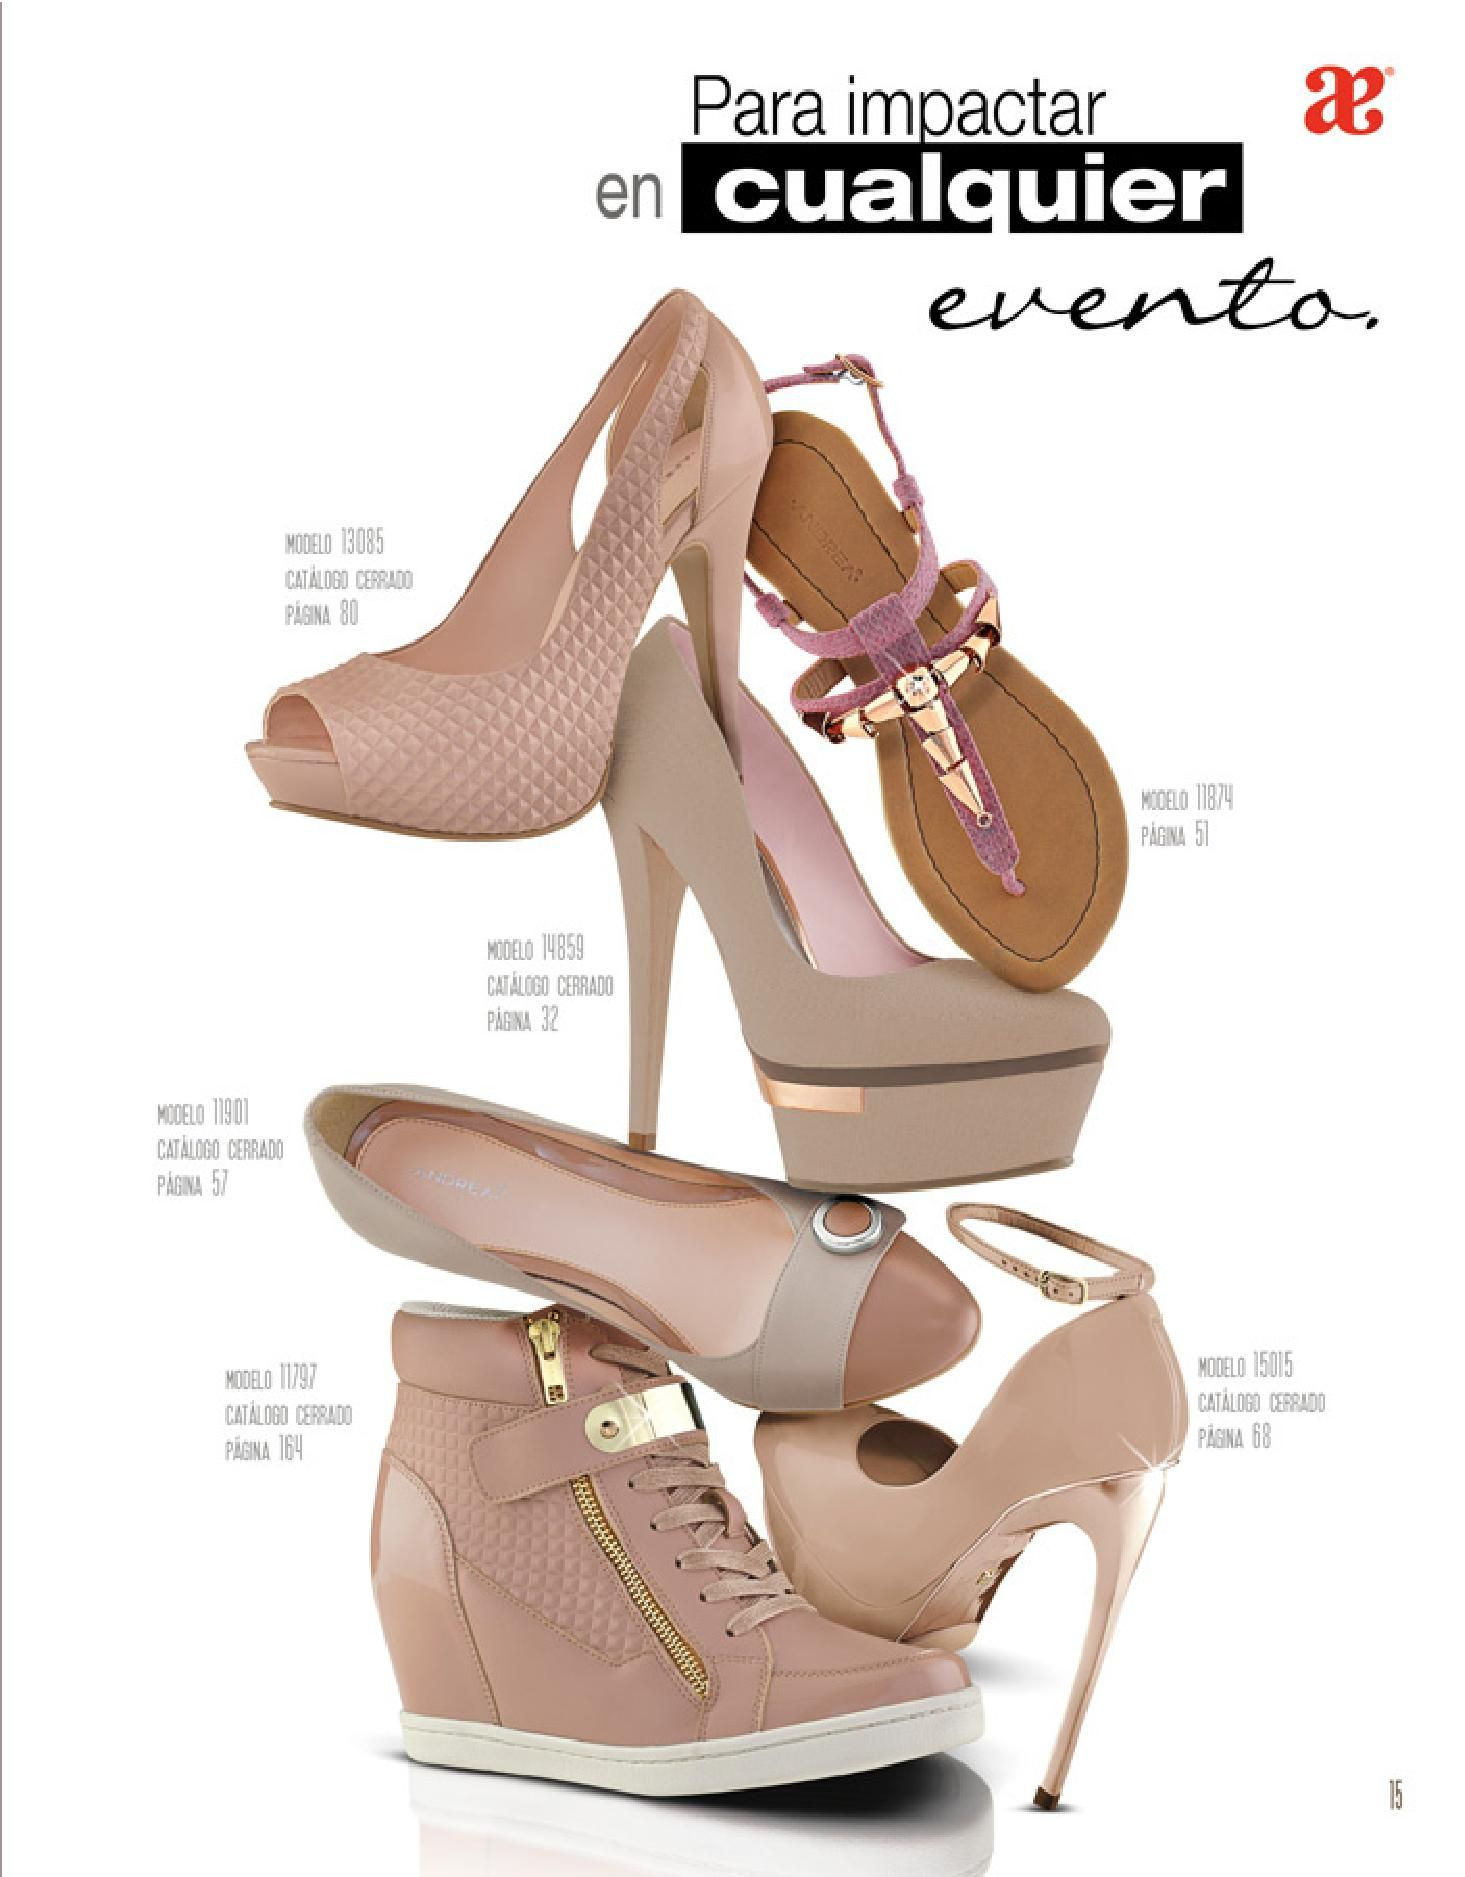 Sandalias Trend Moda Ropa Andrea Catalogo Fashion Monterrey Andrea Shoes Shoes Heels